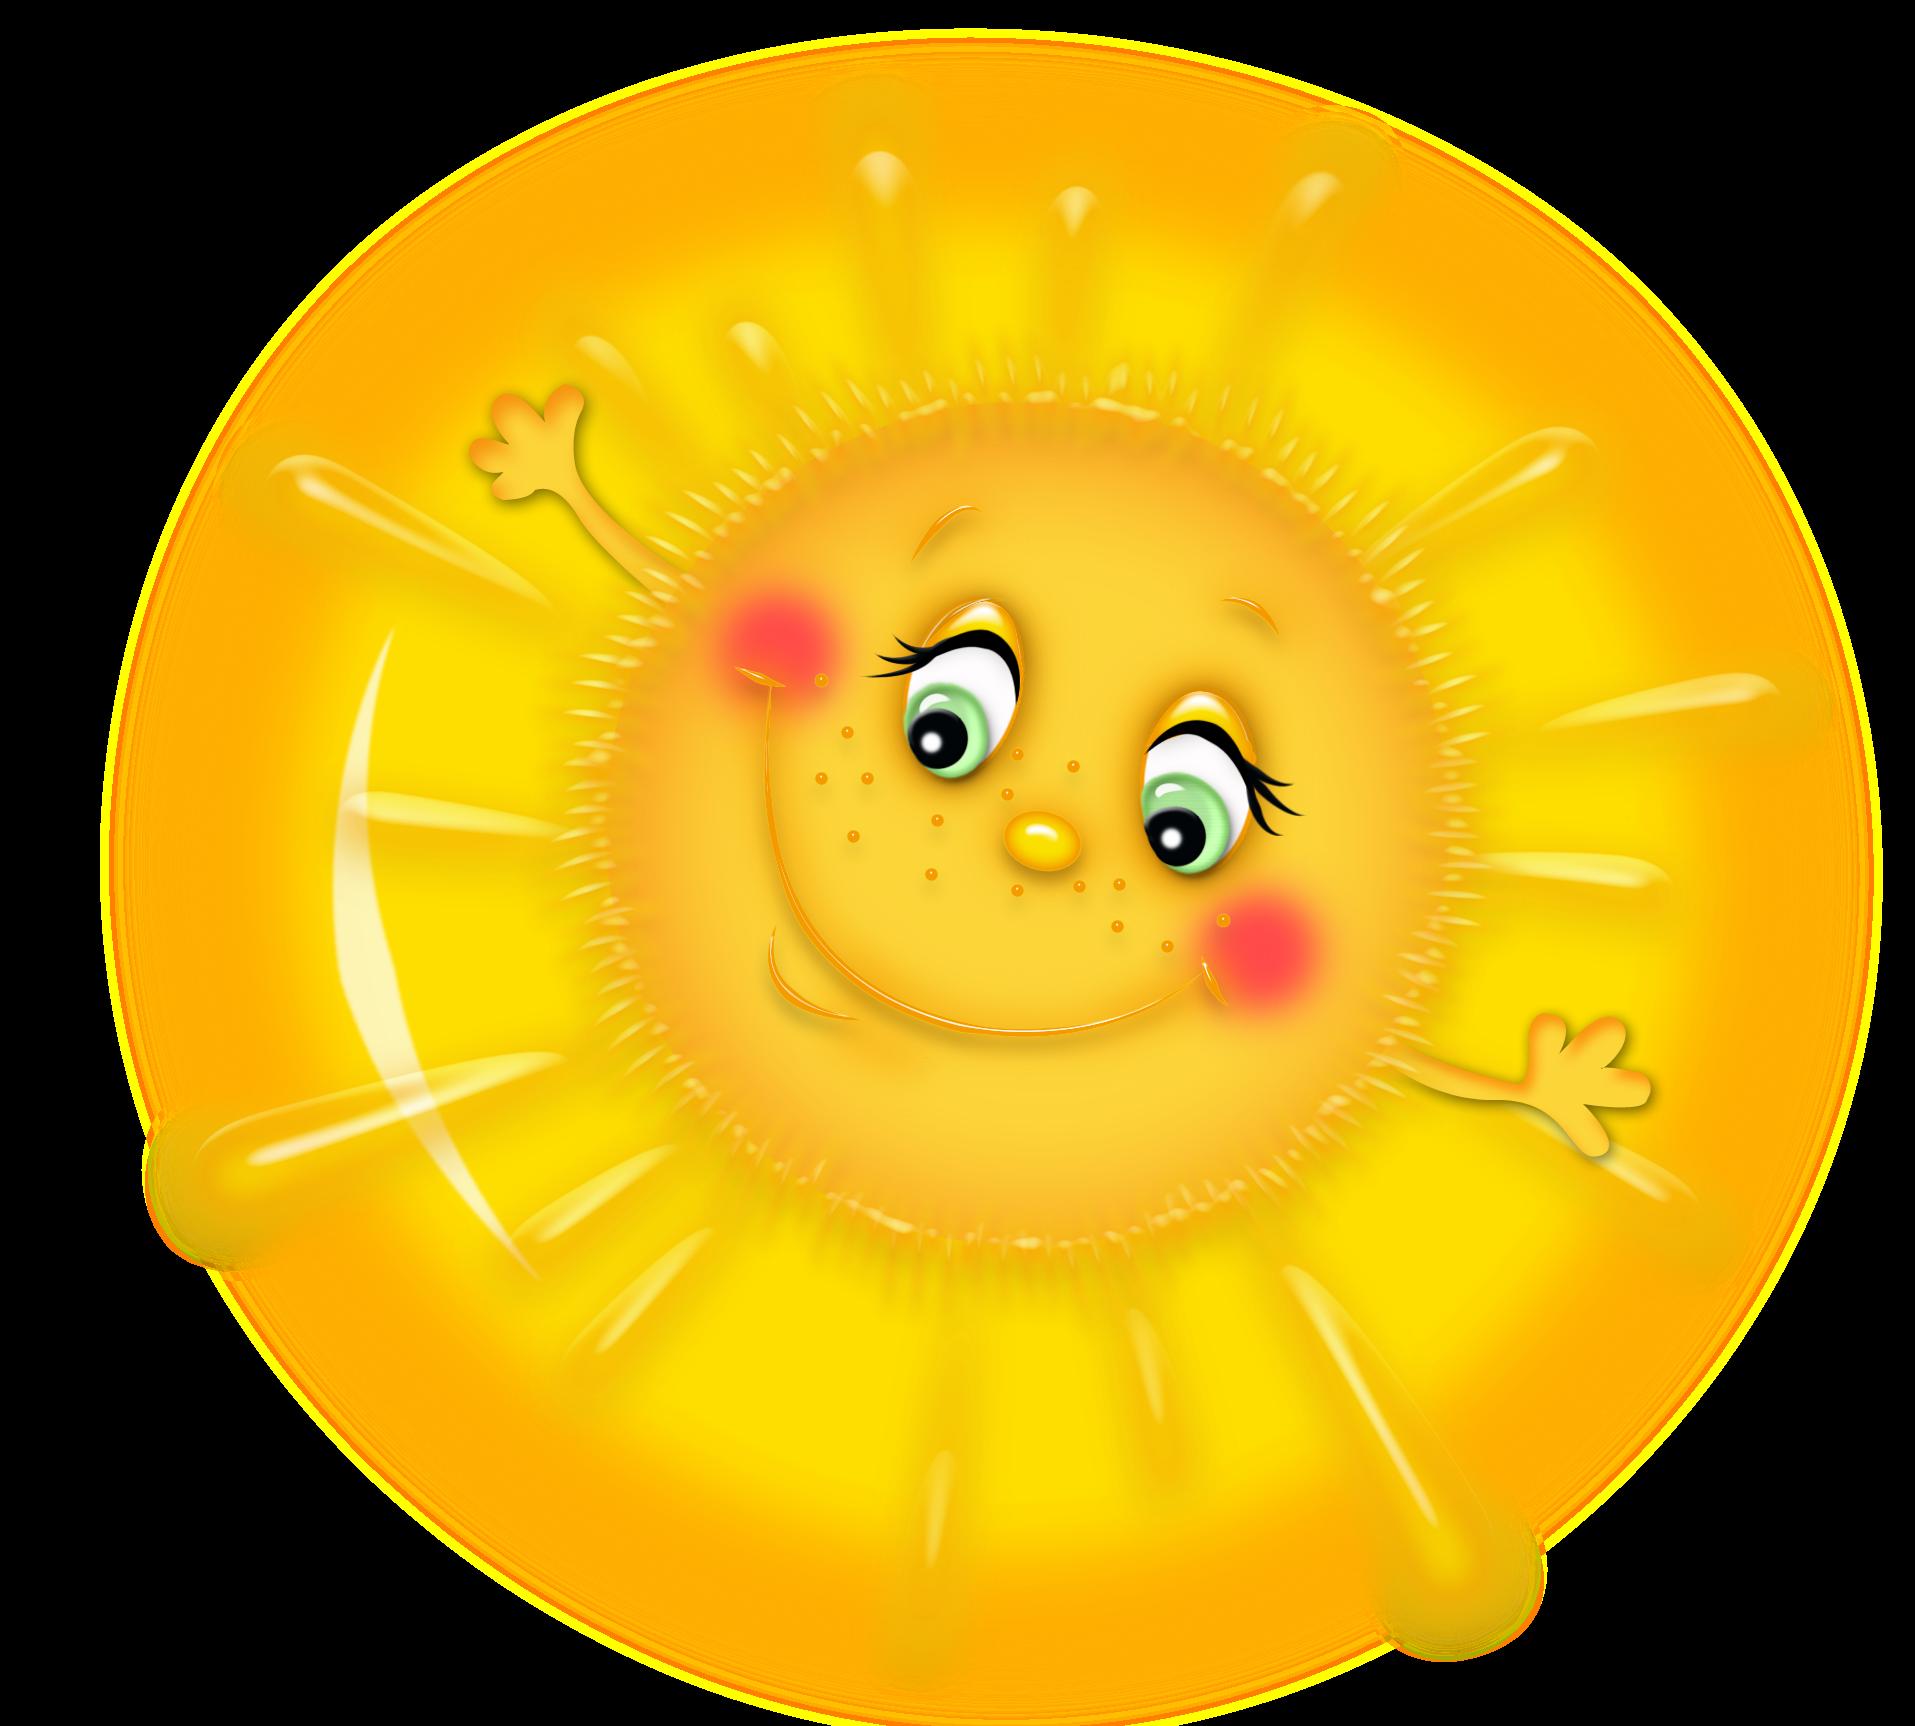 солнышко детское картинки